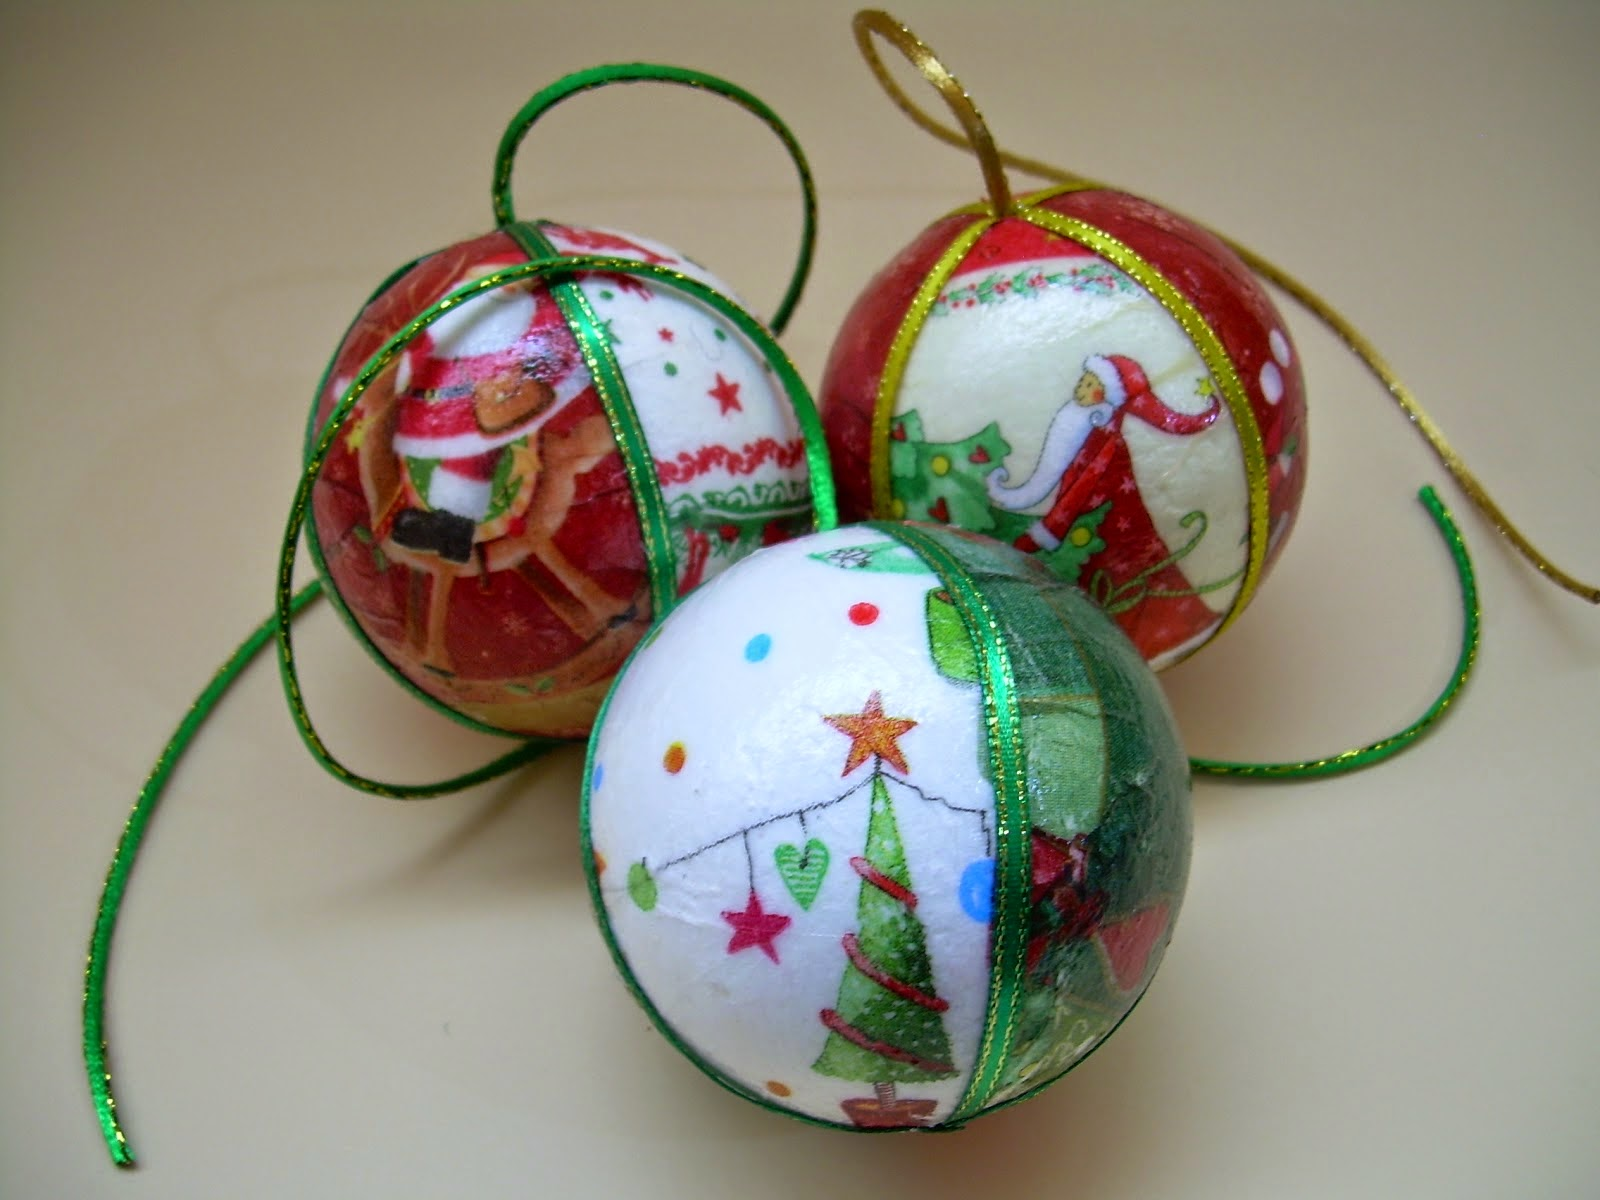 imagen de navidades